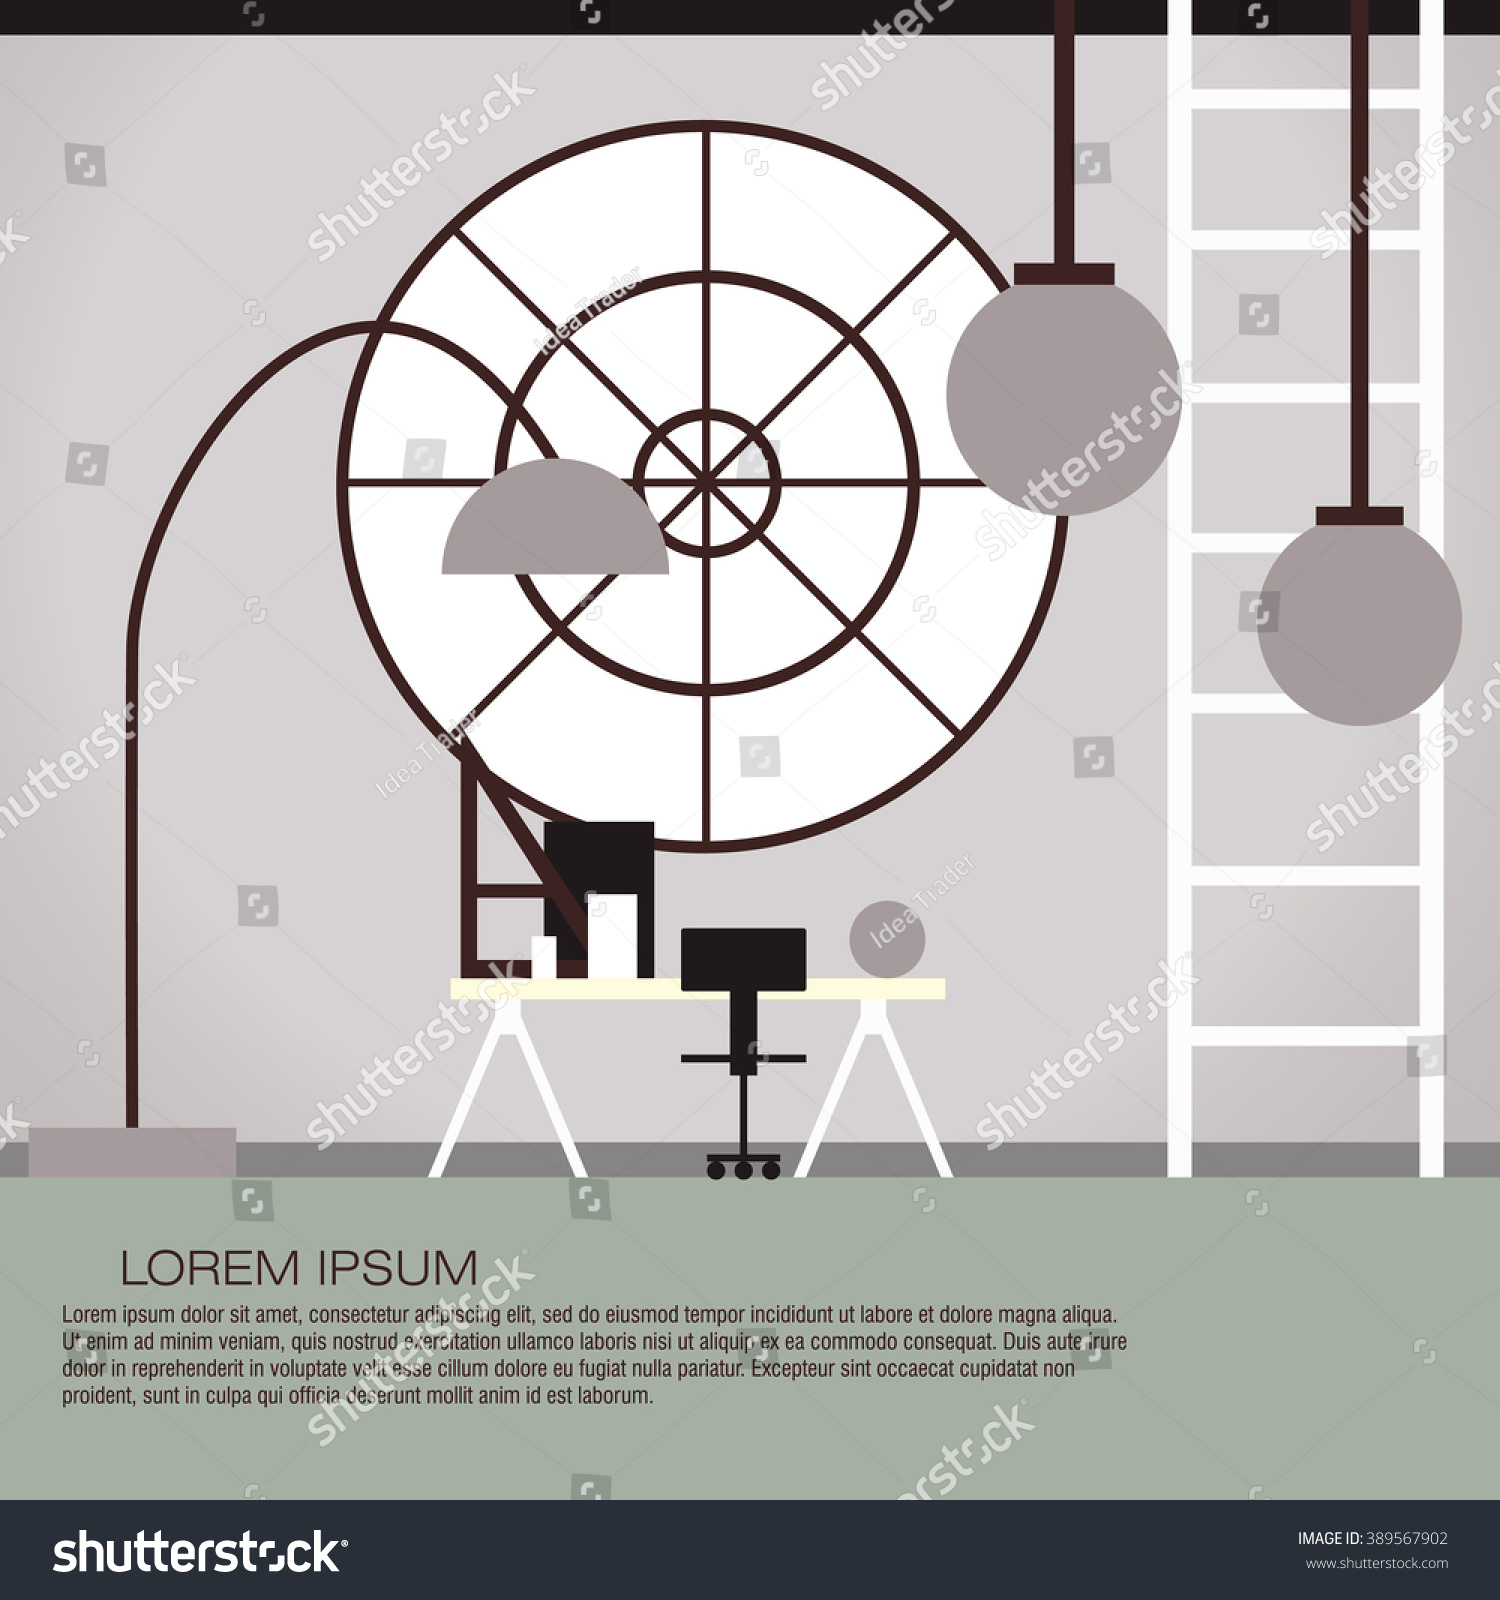 Vector illustration cabinet interior design colorful stock for Interior design banner images